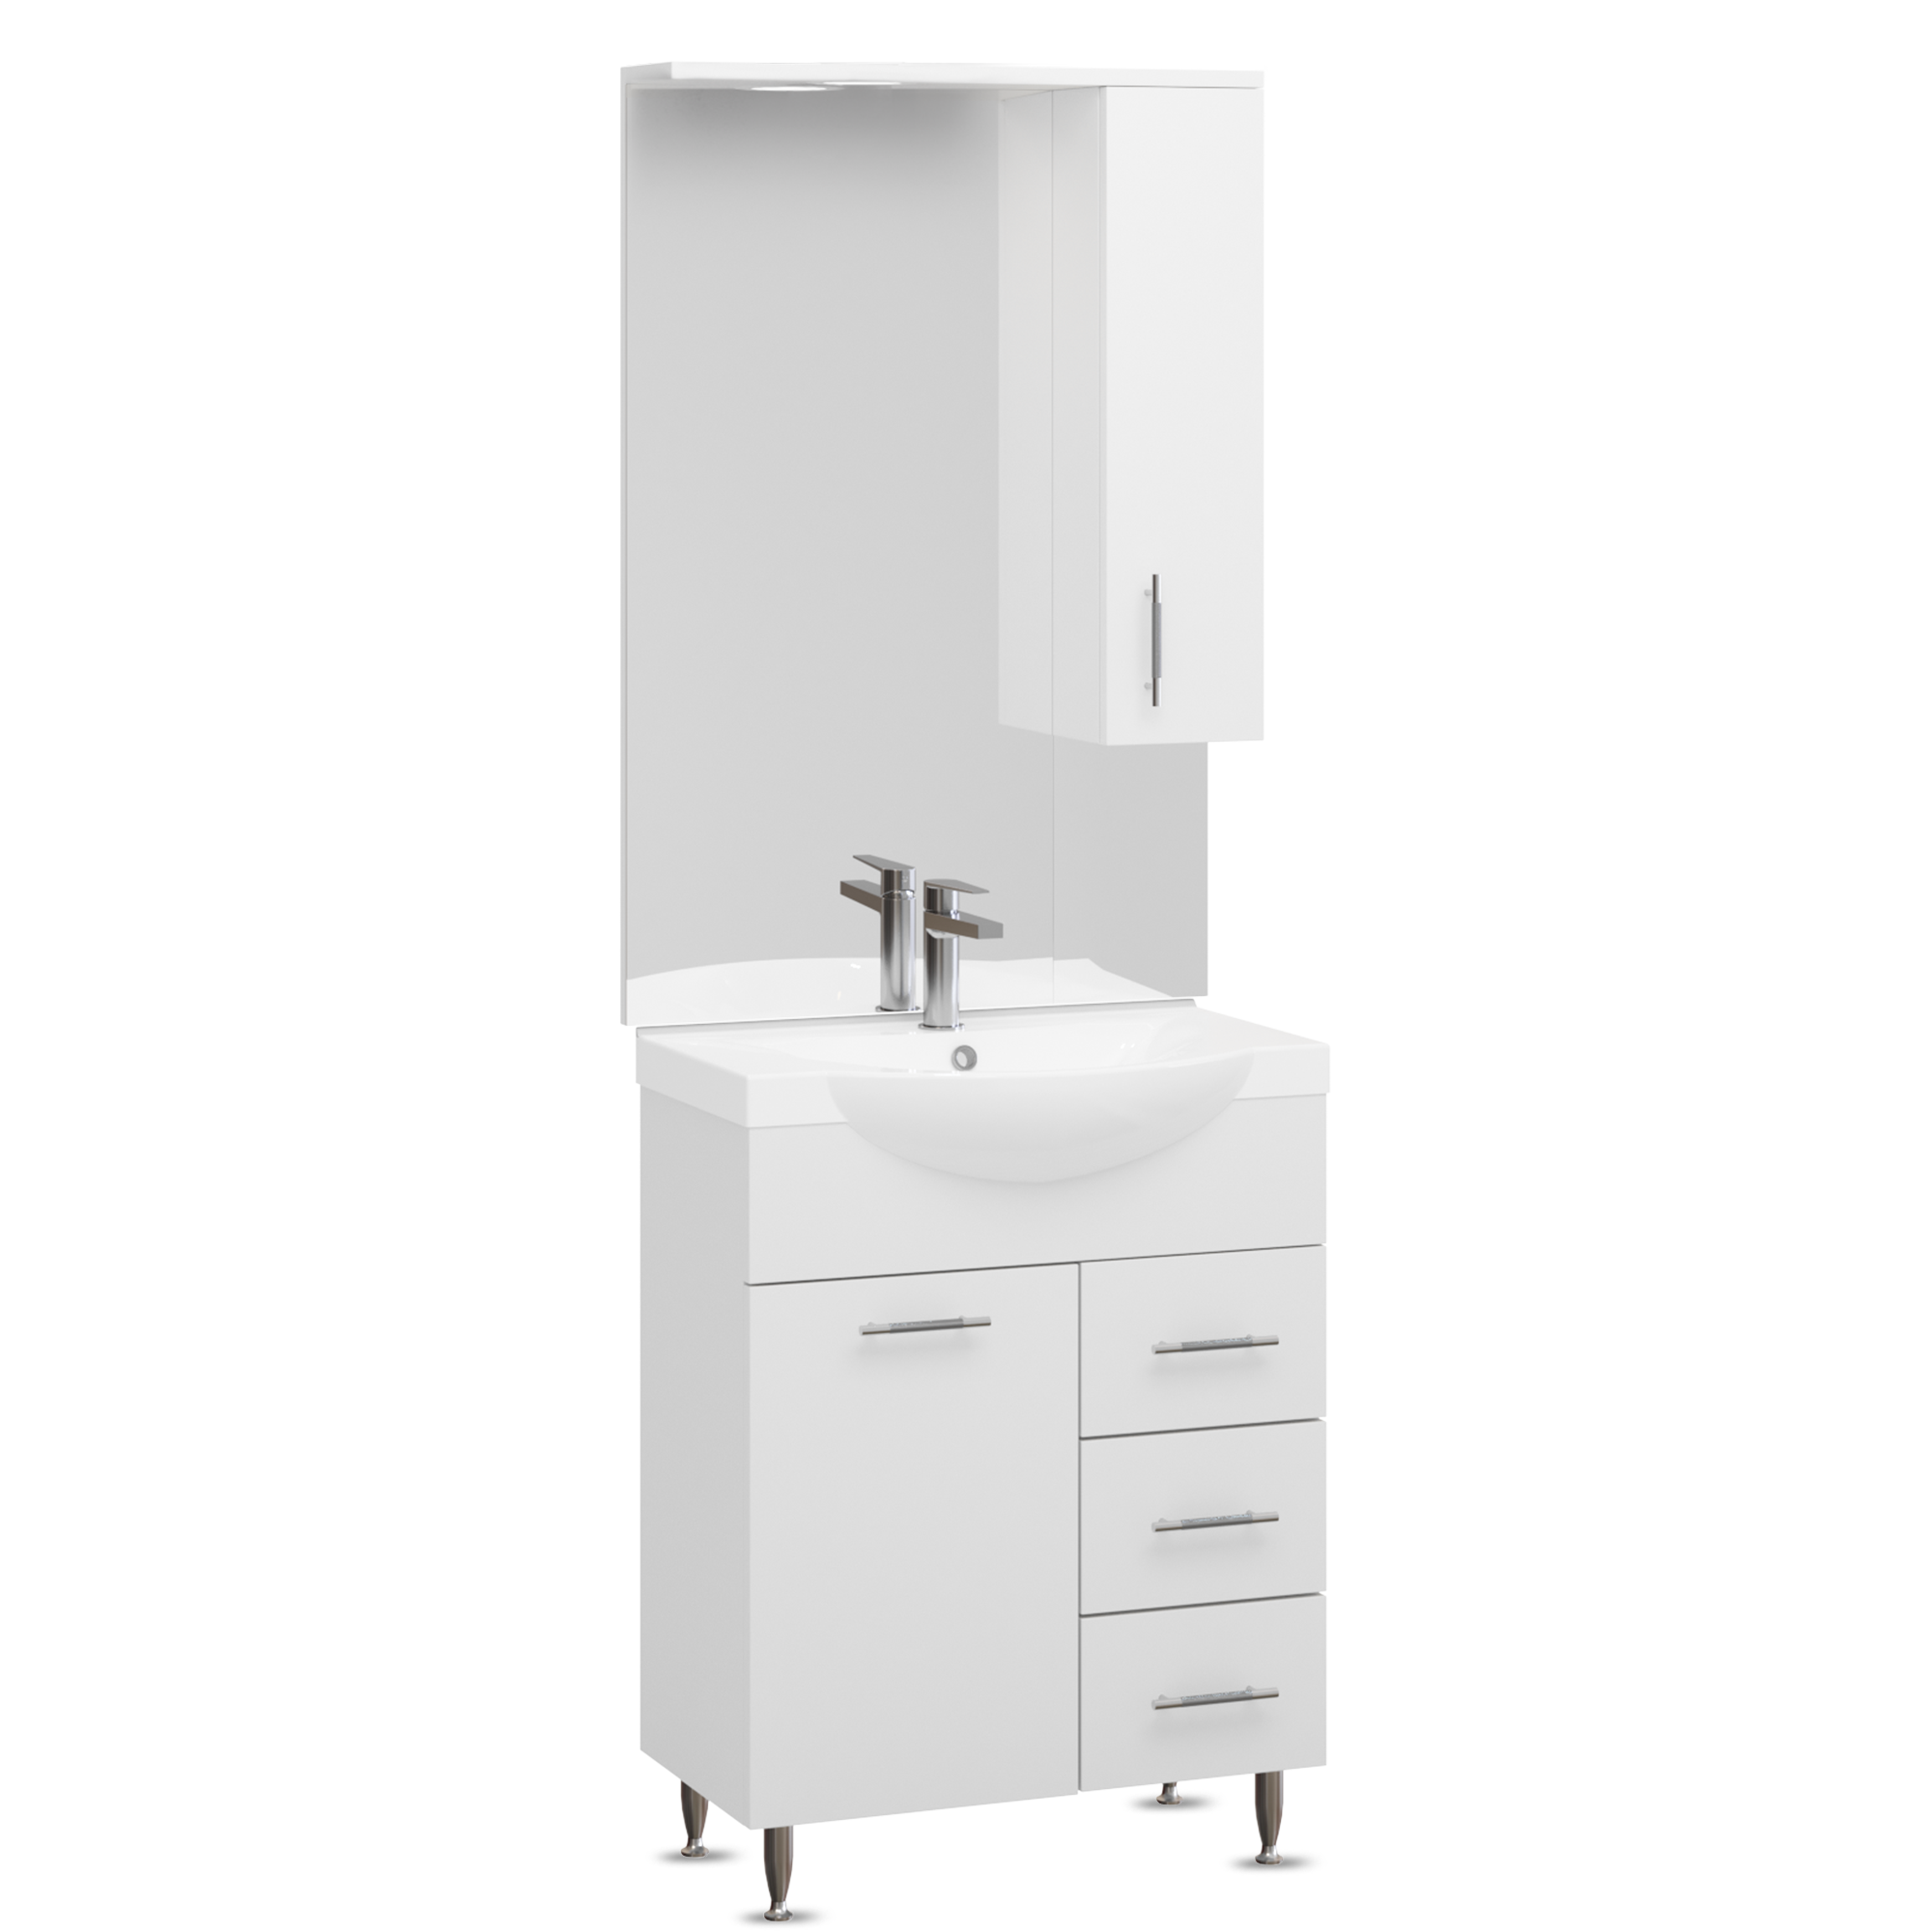 Set mobilier baie Badenmob Seria 153-65, masca cu sertare + lavoar + oglinda, alb imagine 2021 mathaus